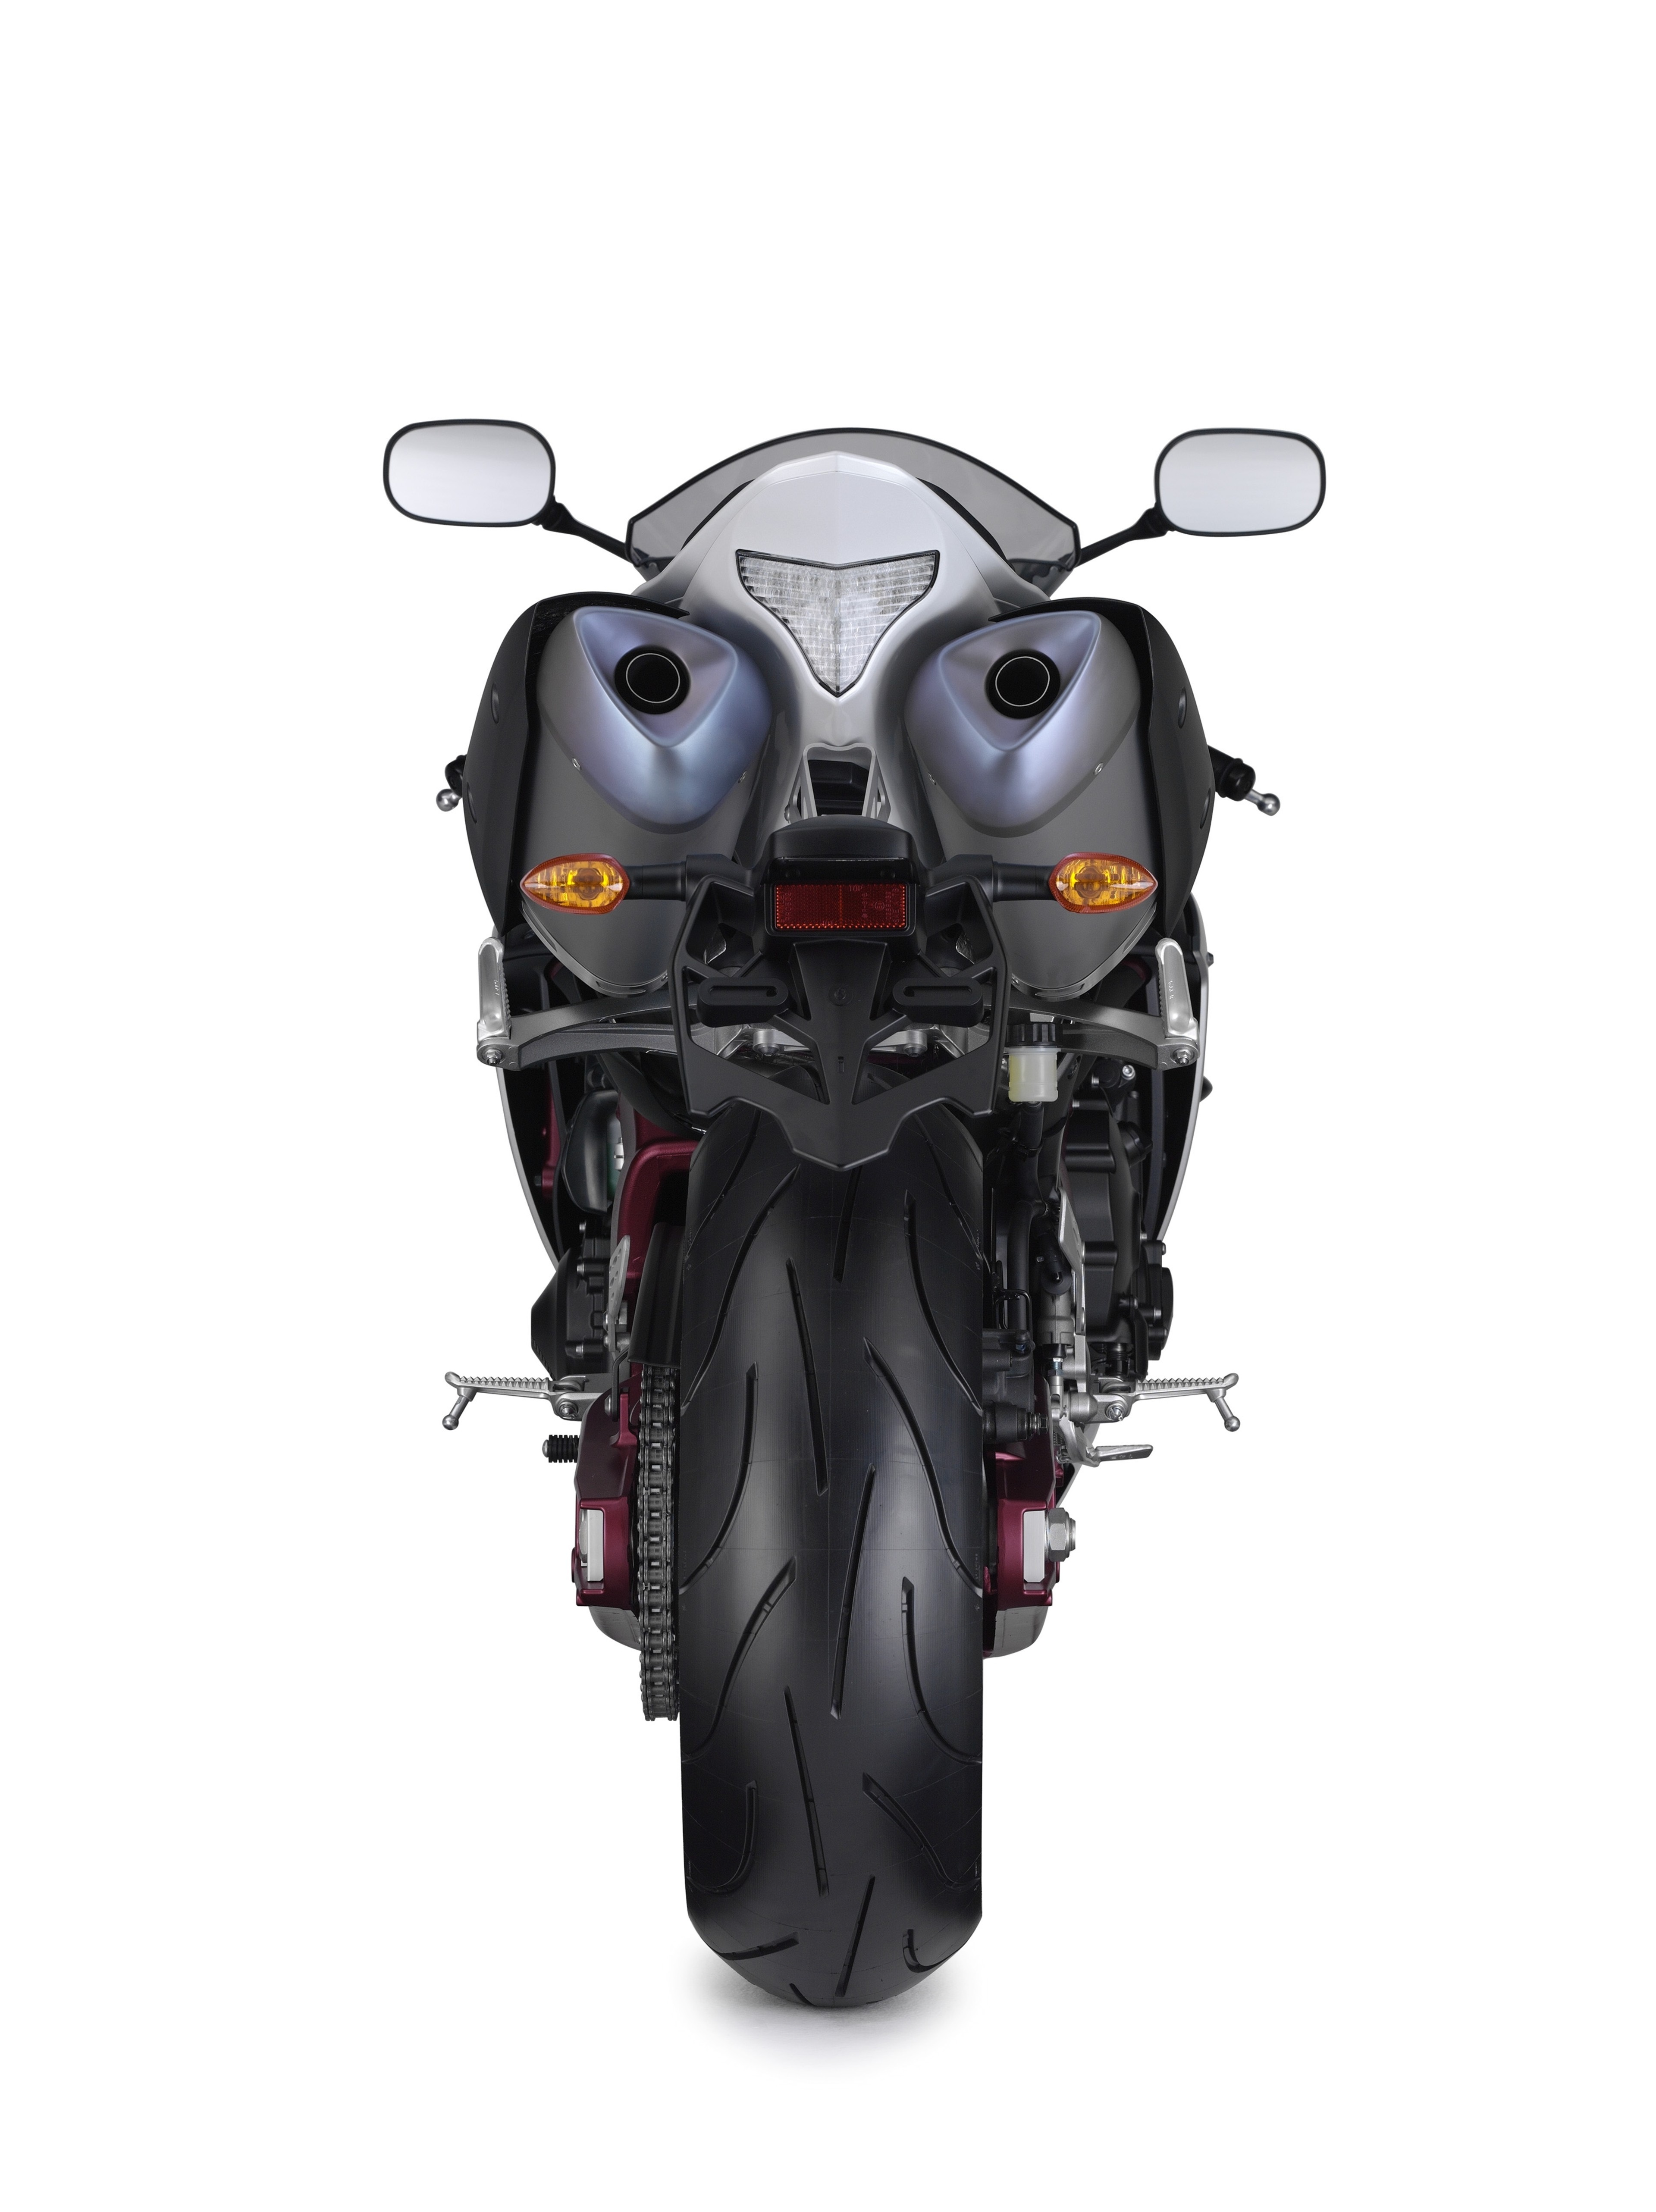 For Sale: Yamaha YZF-R1 • The Bike Market